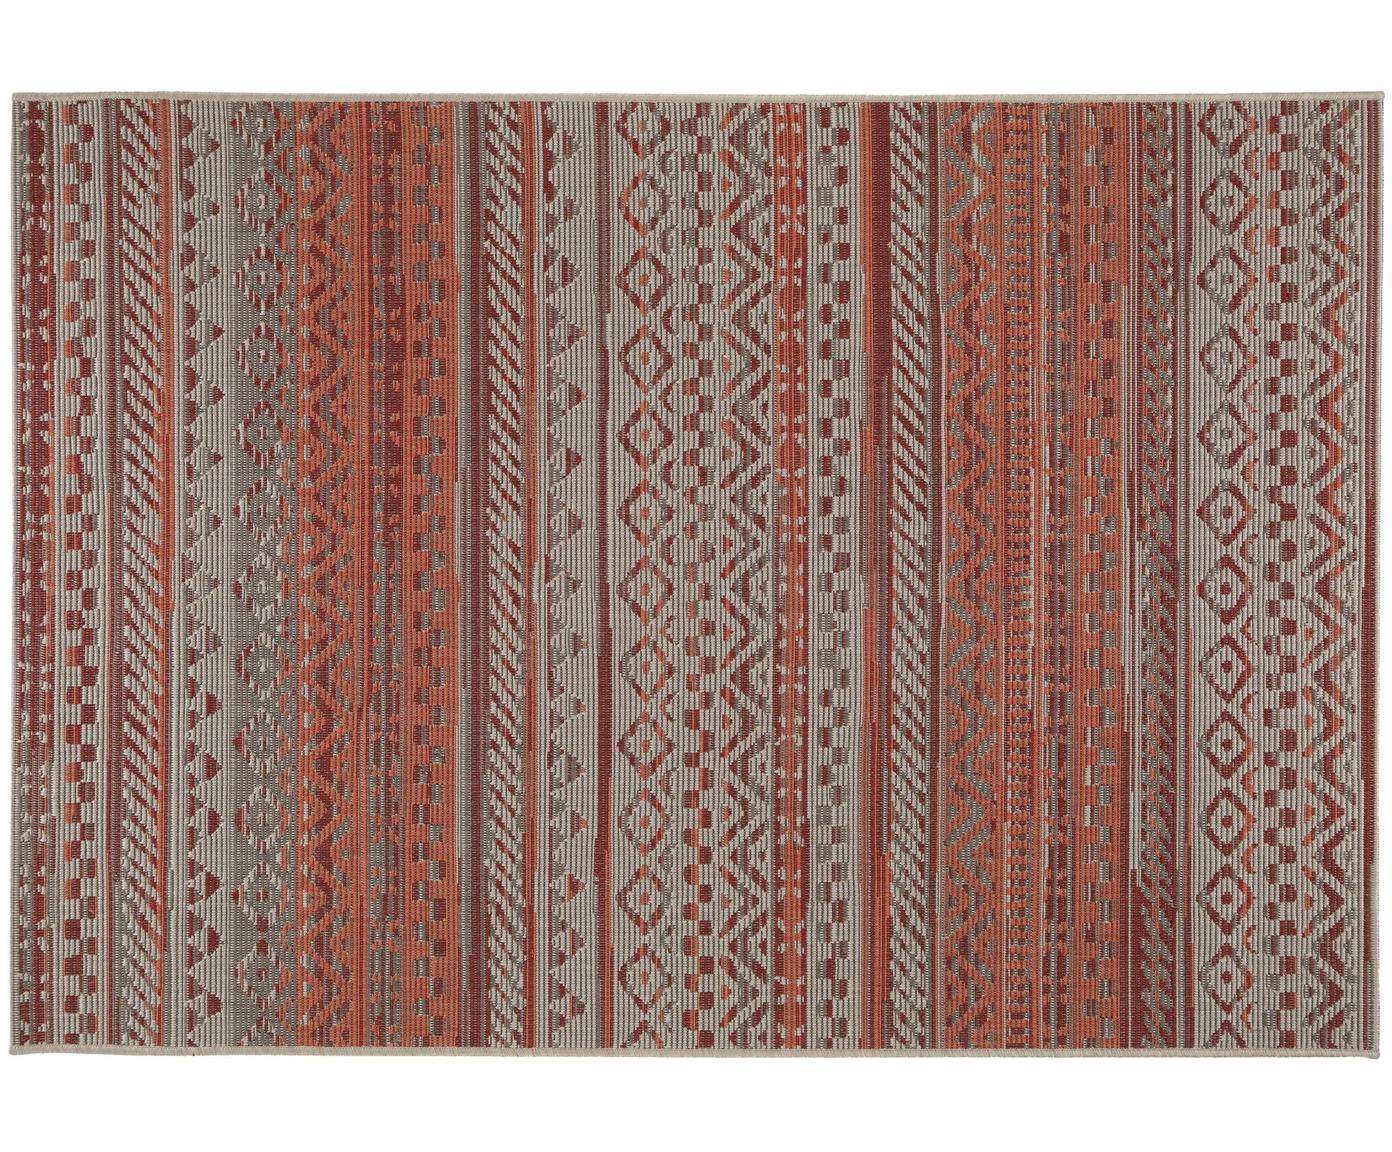 In- & Outdoor-Teppich Carina, 100% Polypropylen, Rot, B 120 x L 170 cm (Größe S)